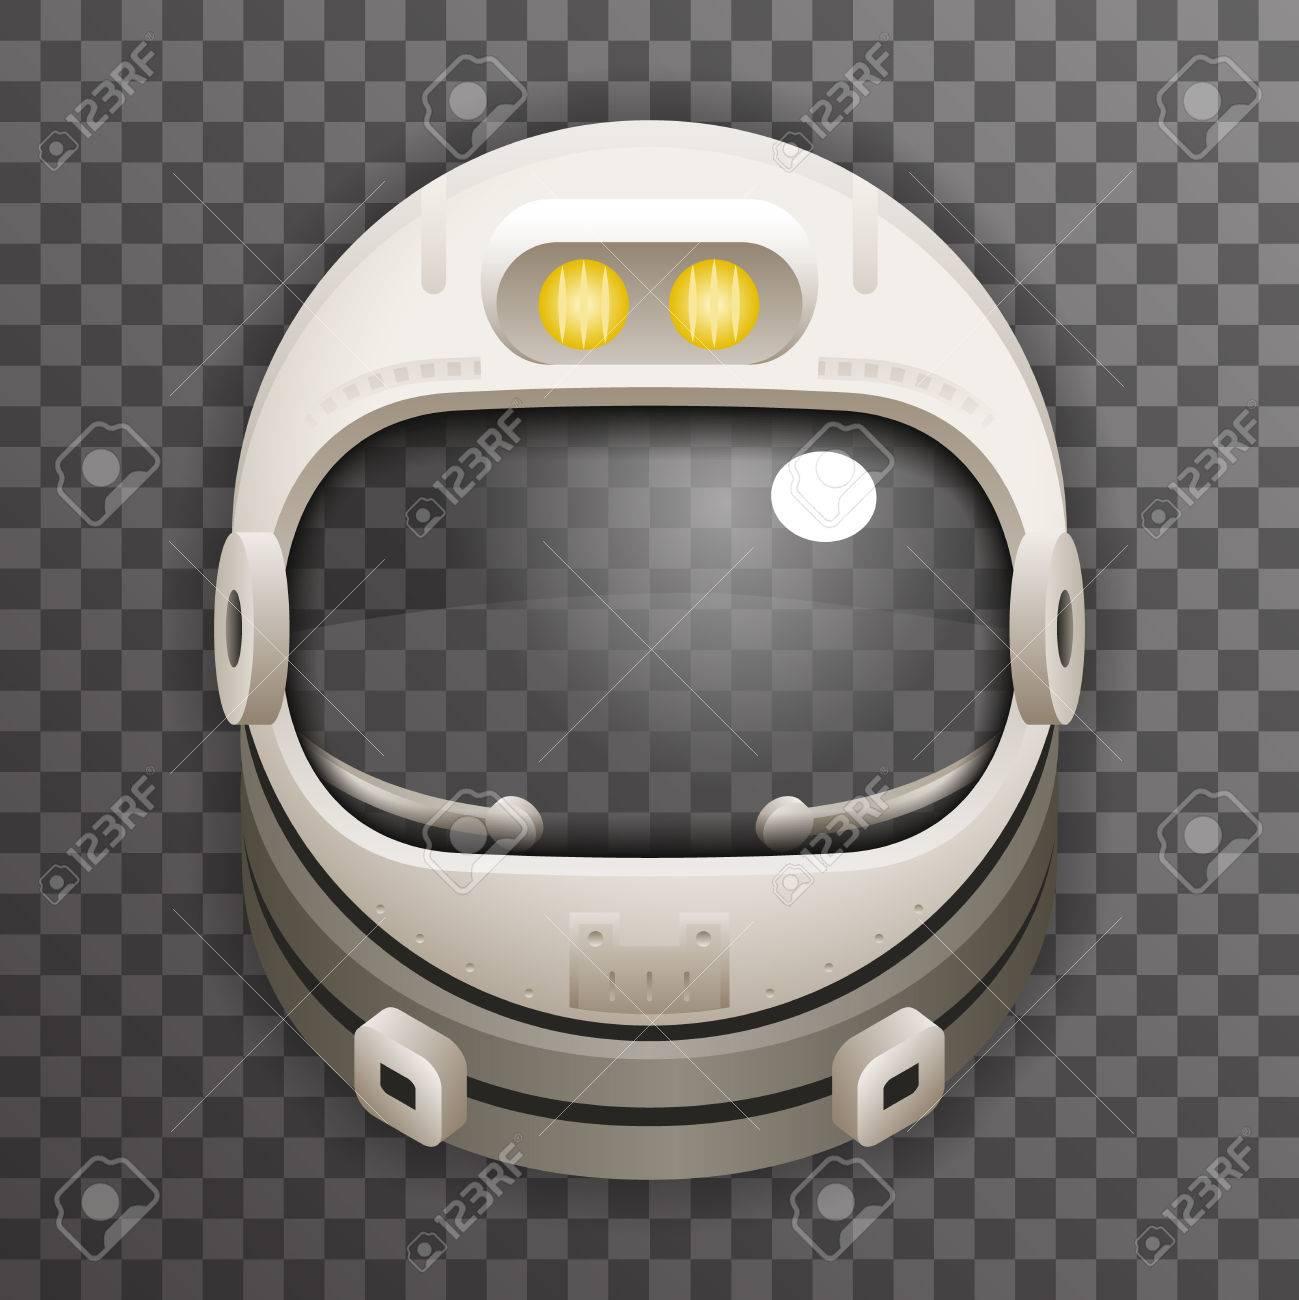 Realistic Helmet Cosmonaut Astronaut Spaceman Tantamareska Poster Transperent Glass Background Icon Template Mock Up Design Vector Illustration - 61098224